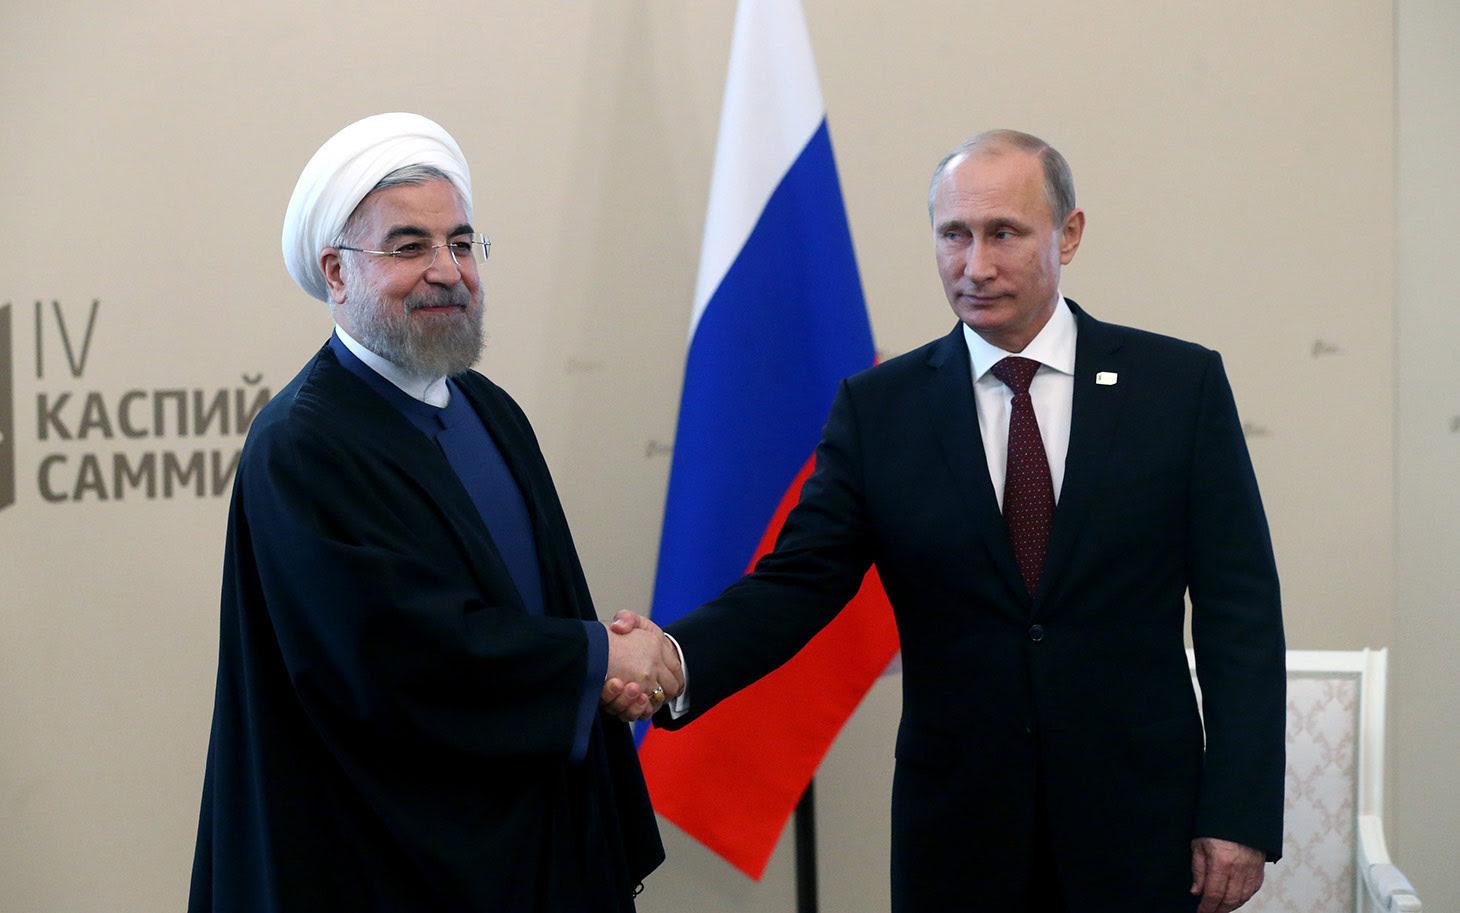 http://russia-insider.com/sites/insider/files/Iran_Russia_041315.jpg